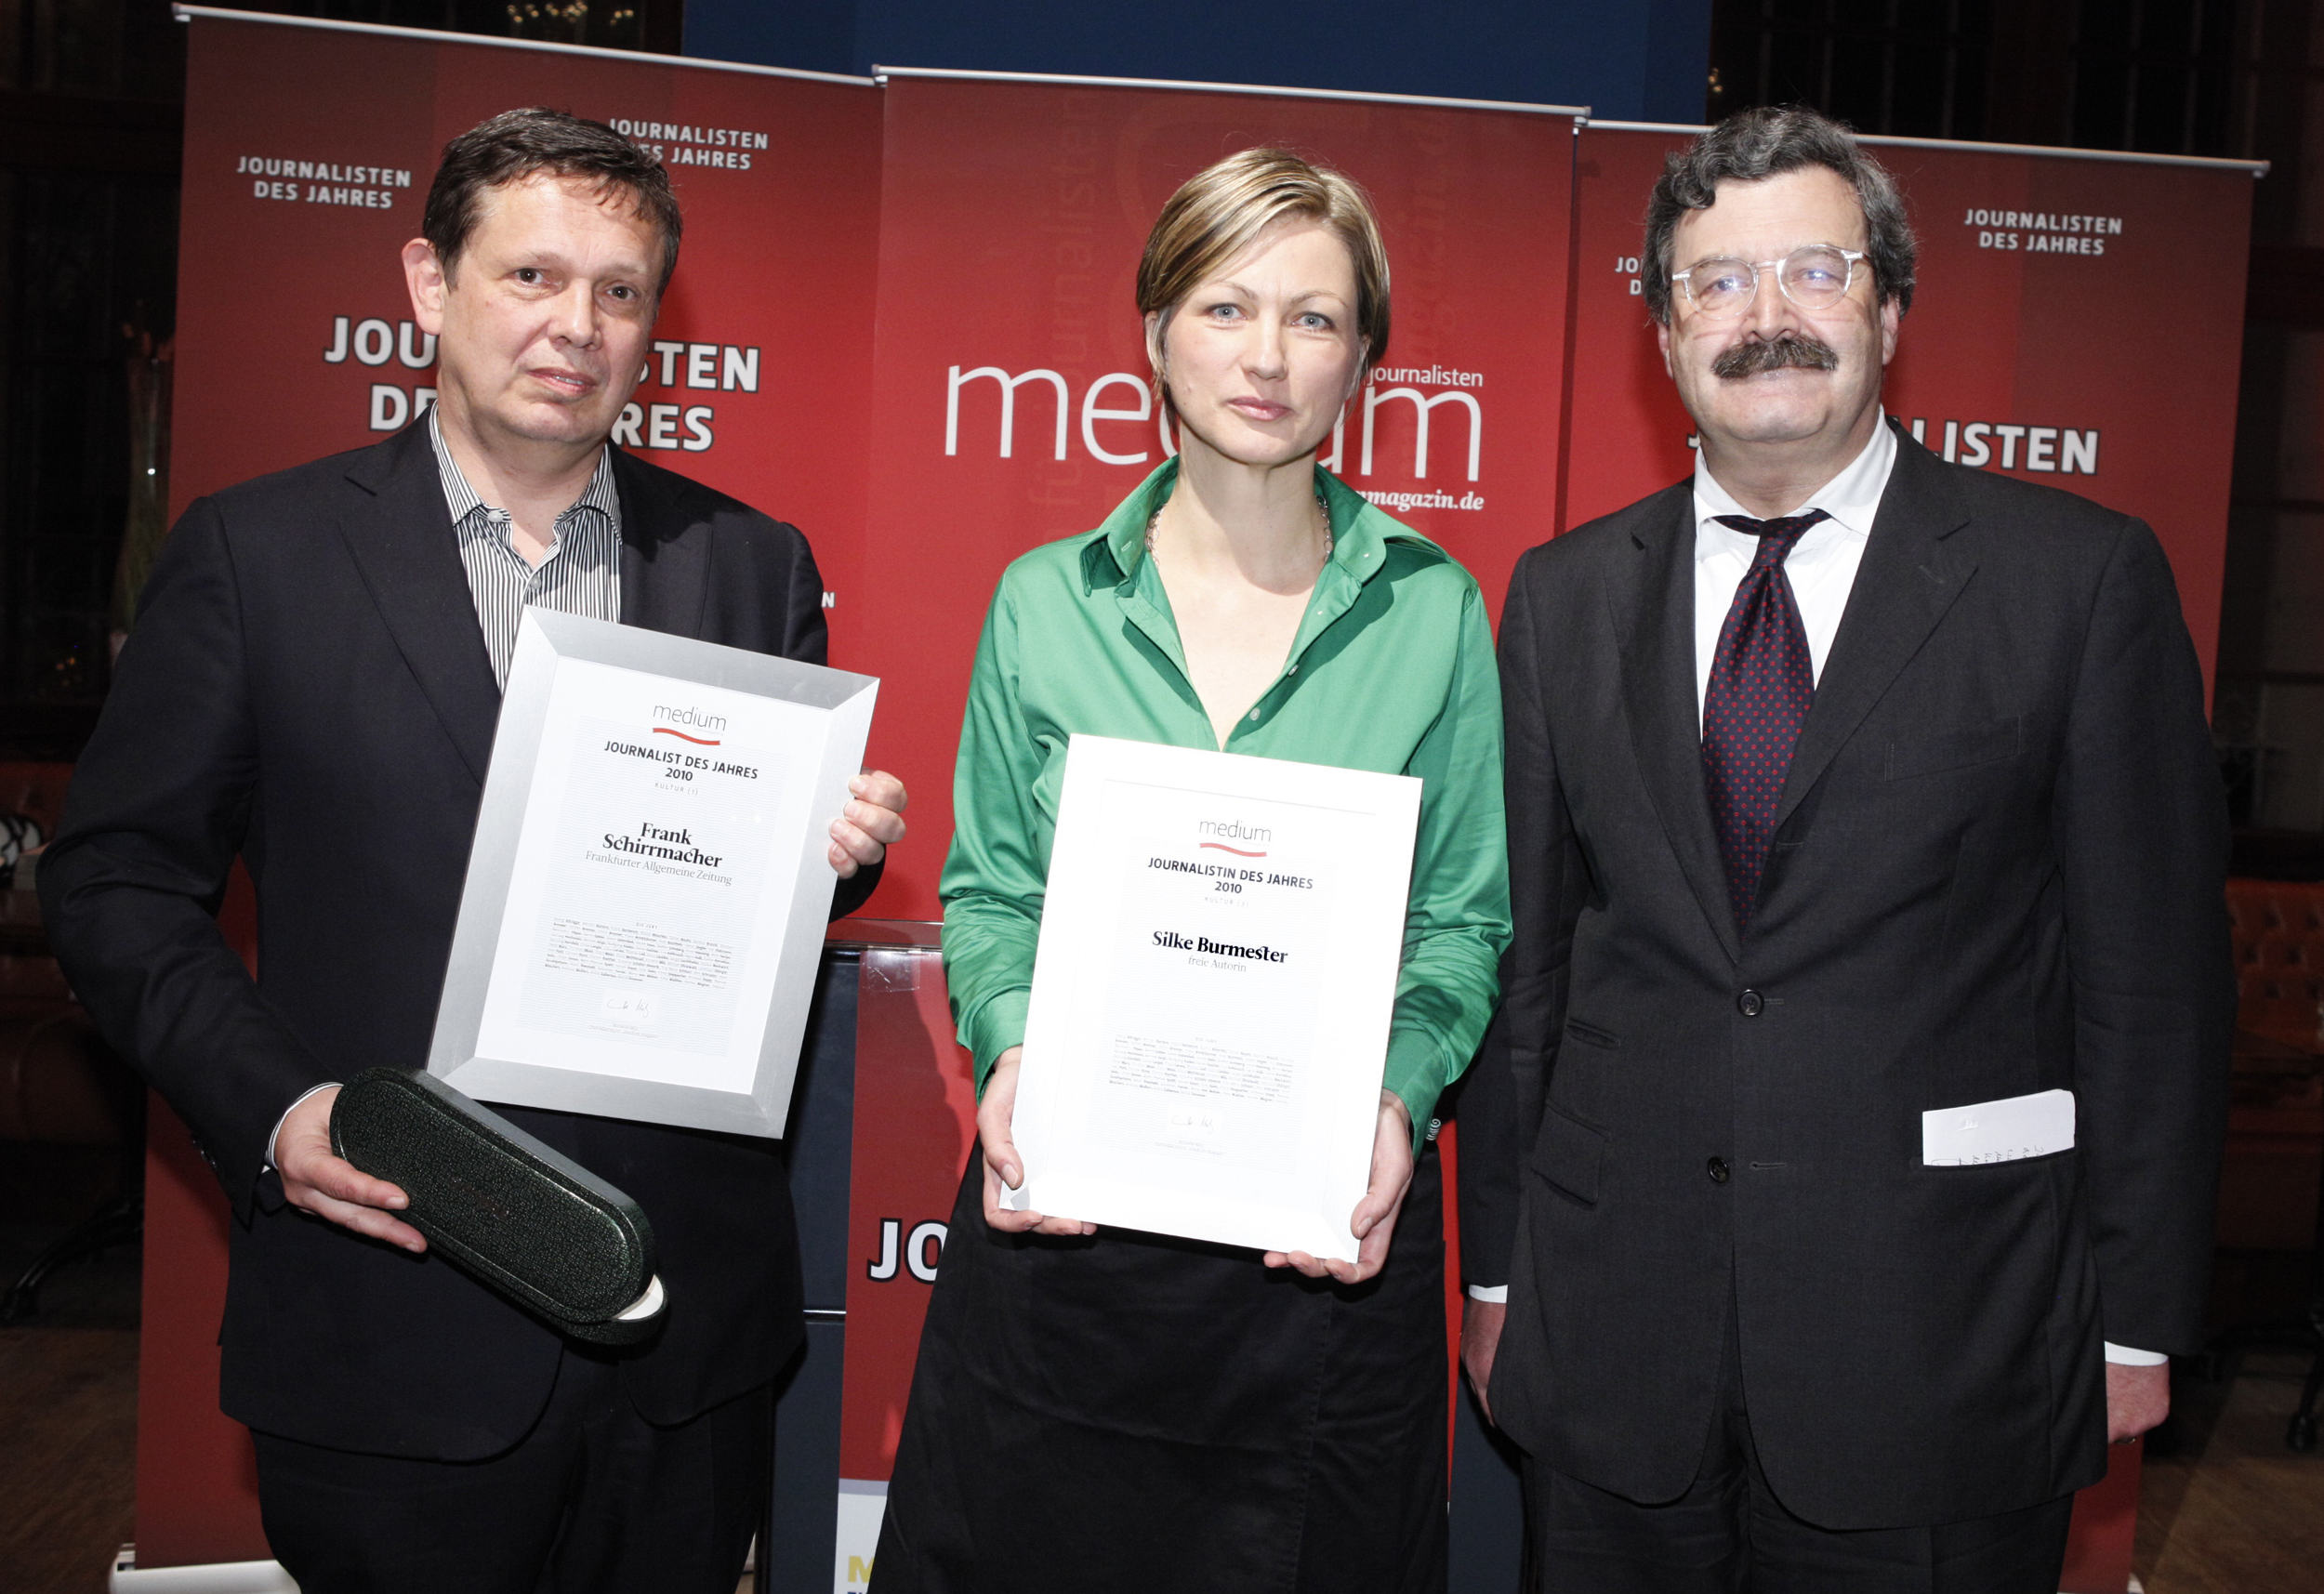 DEU, Berlin, 7.02.2011, medium magazin, Preisverleihung an die